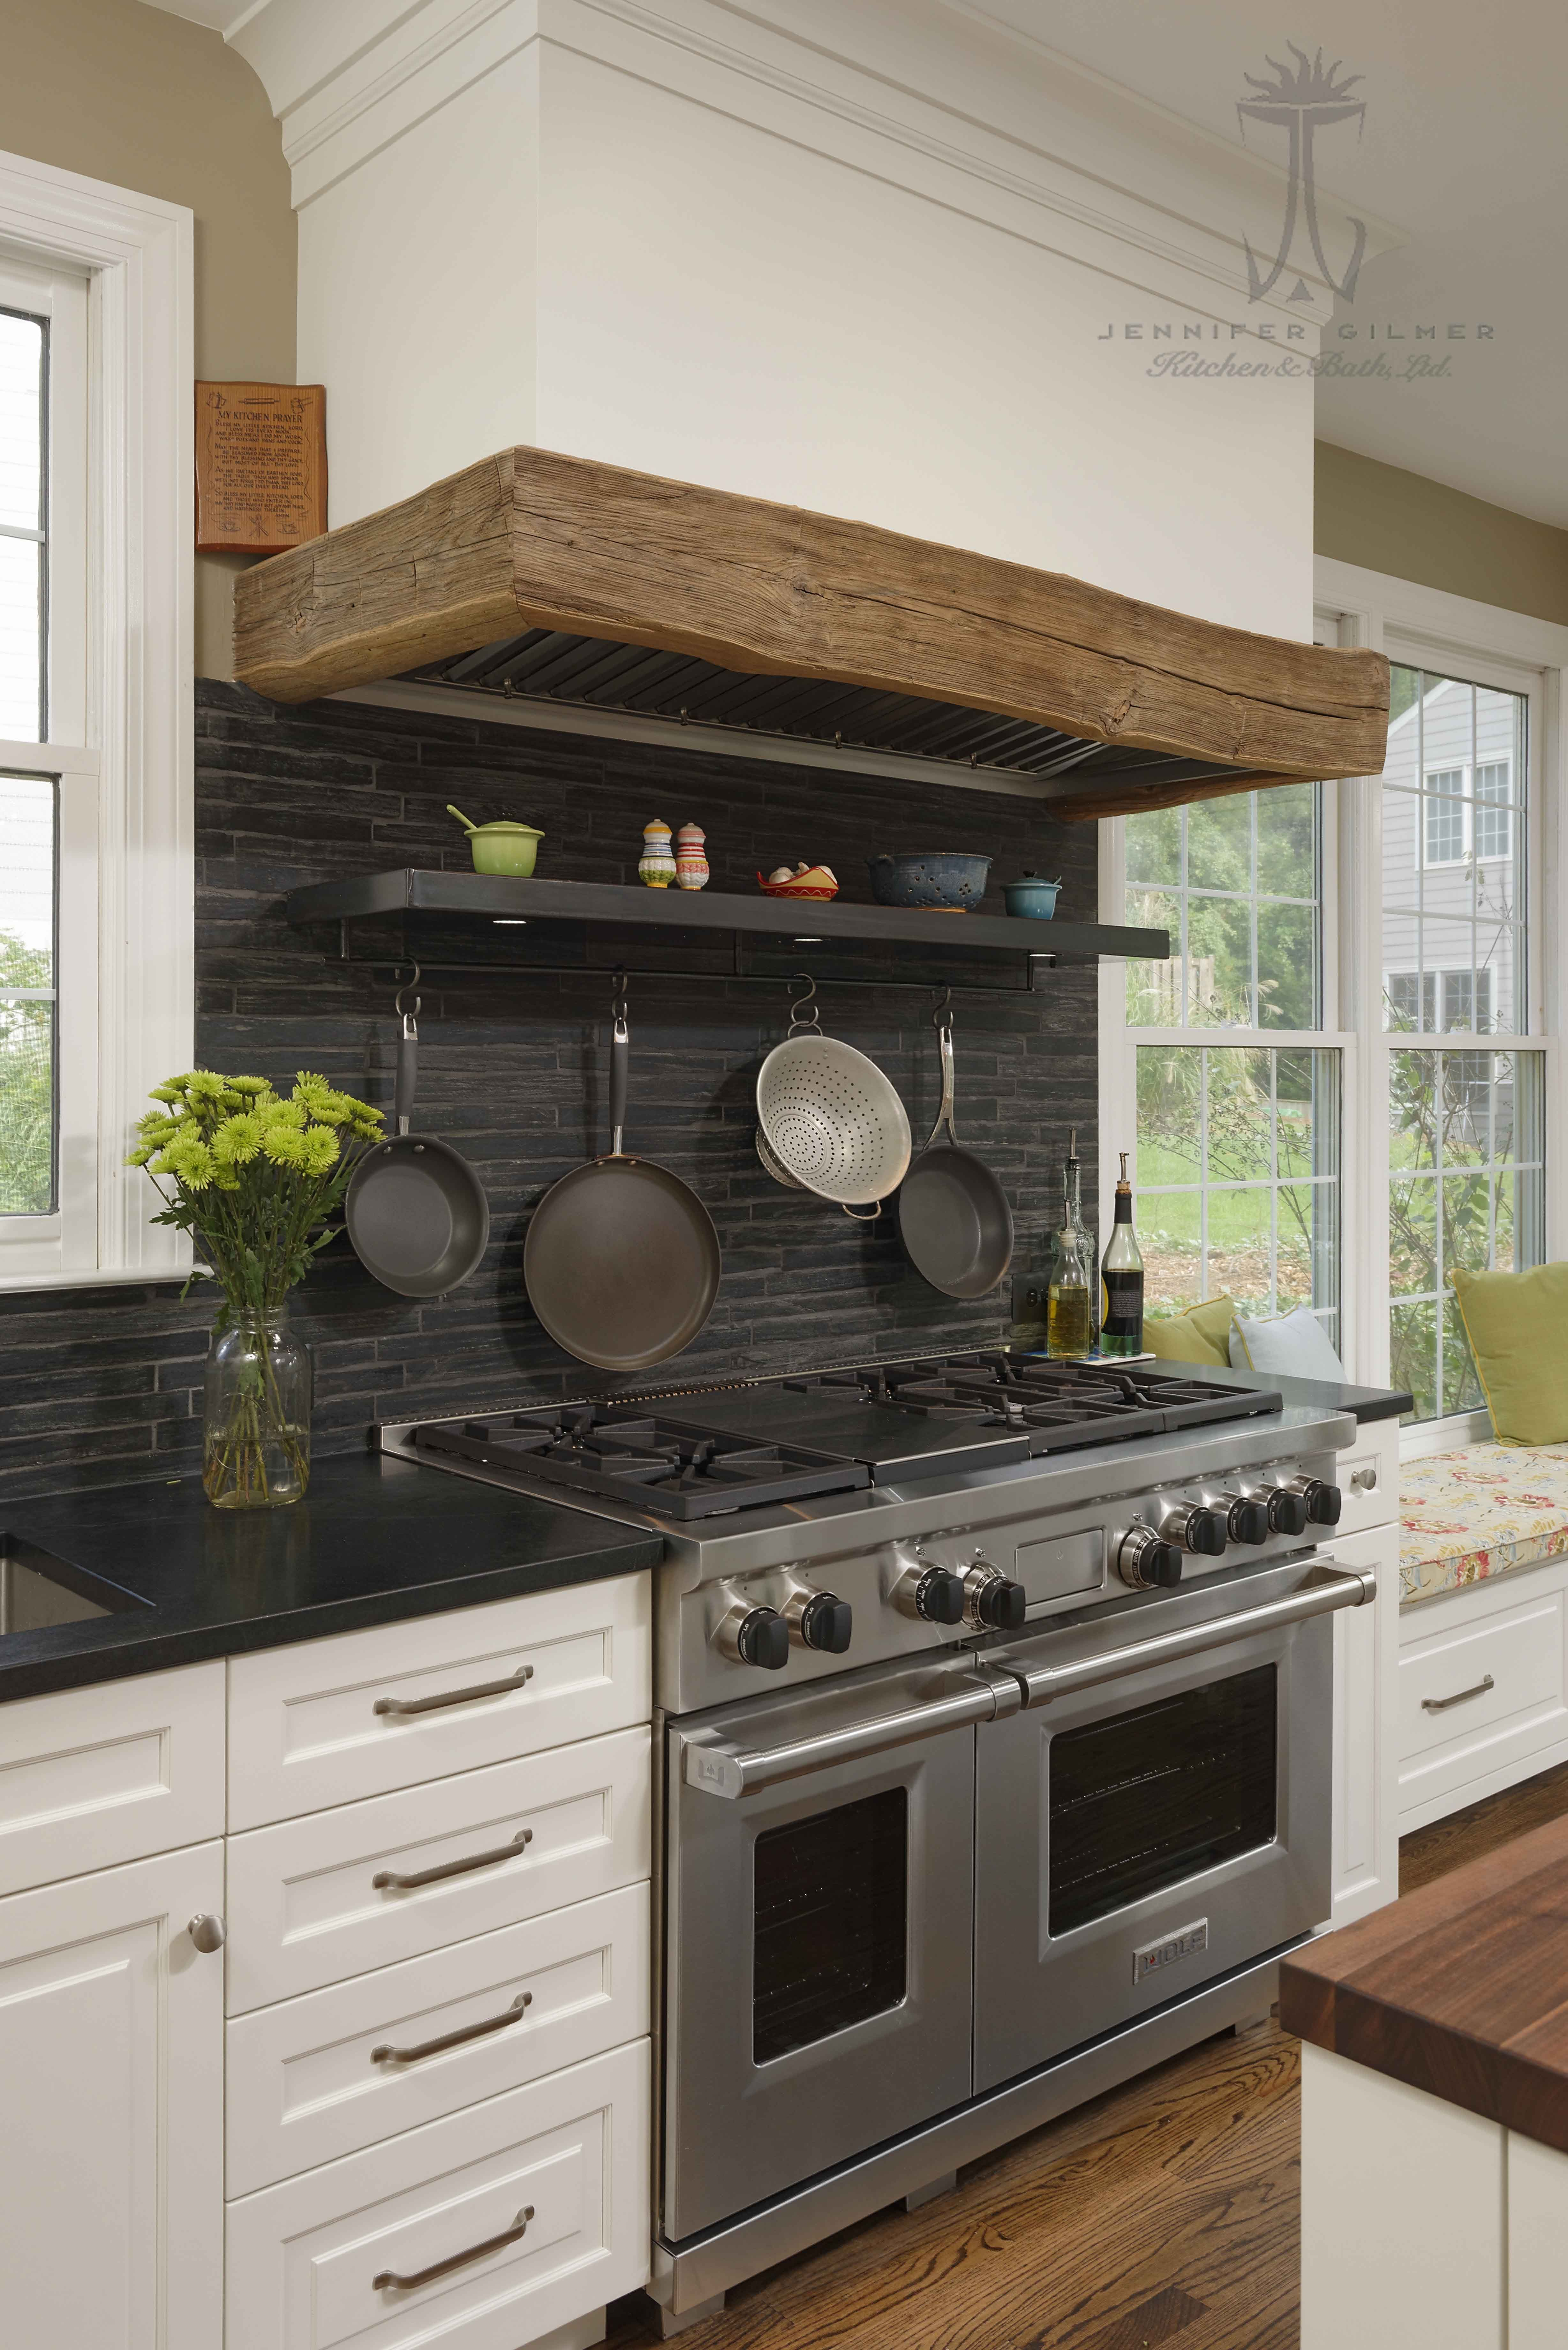 Kitchen Design#sarahturner4Jennifergilmer Includes Wolf Gr486G Awesome Pro Kitchen Design Inspiration